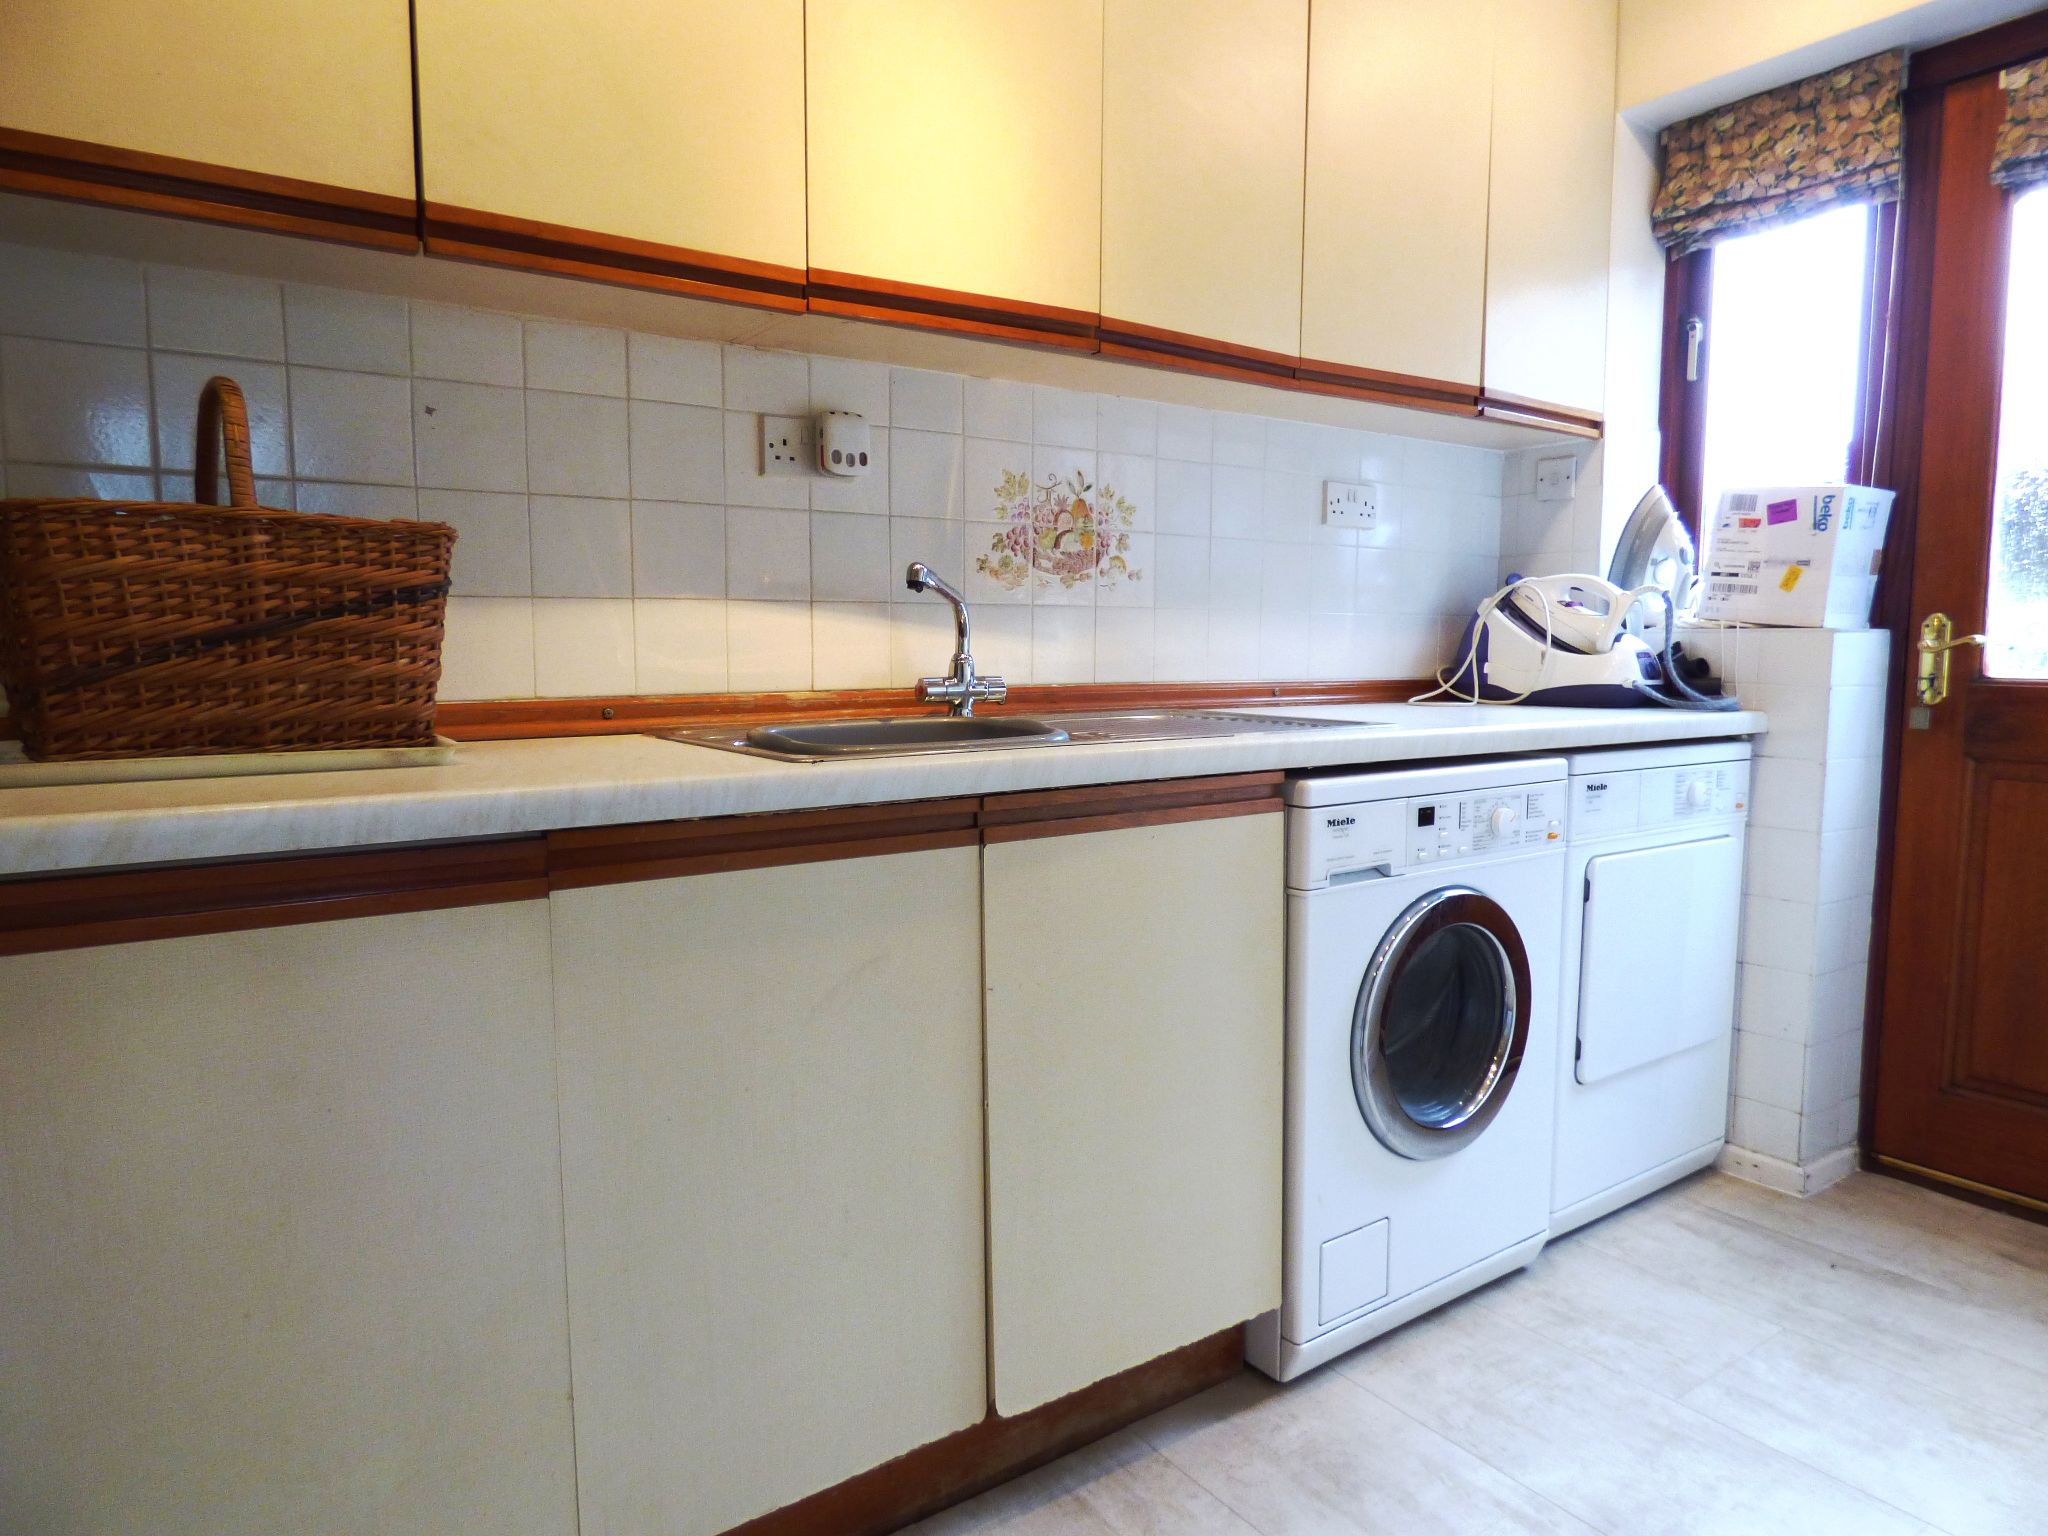 4 Bedroom Detached House For Sale - Utility Room